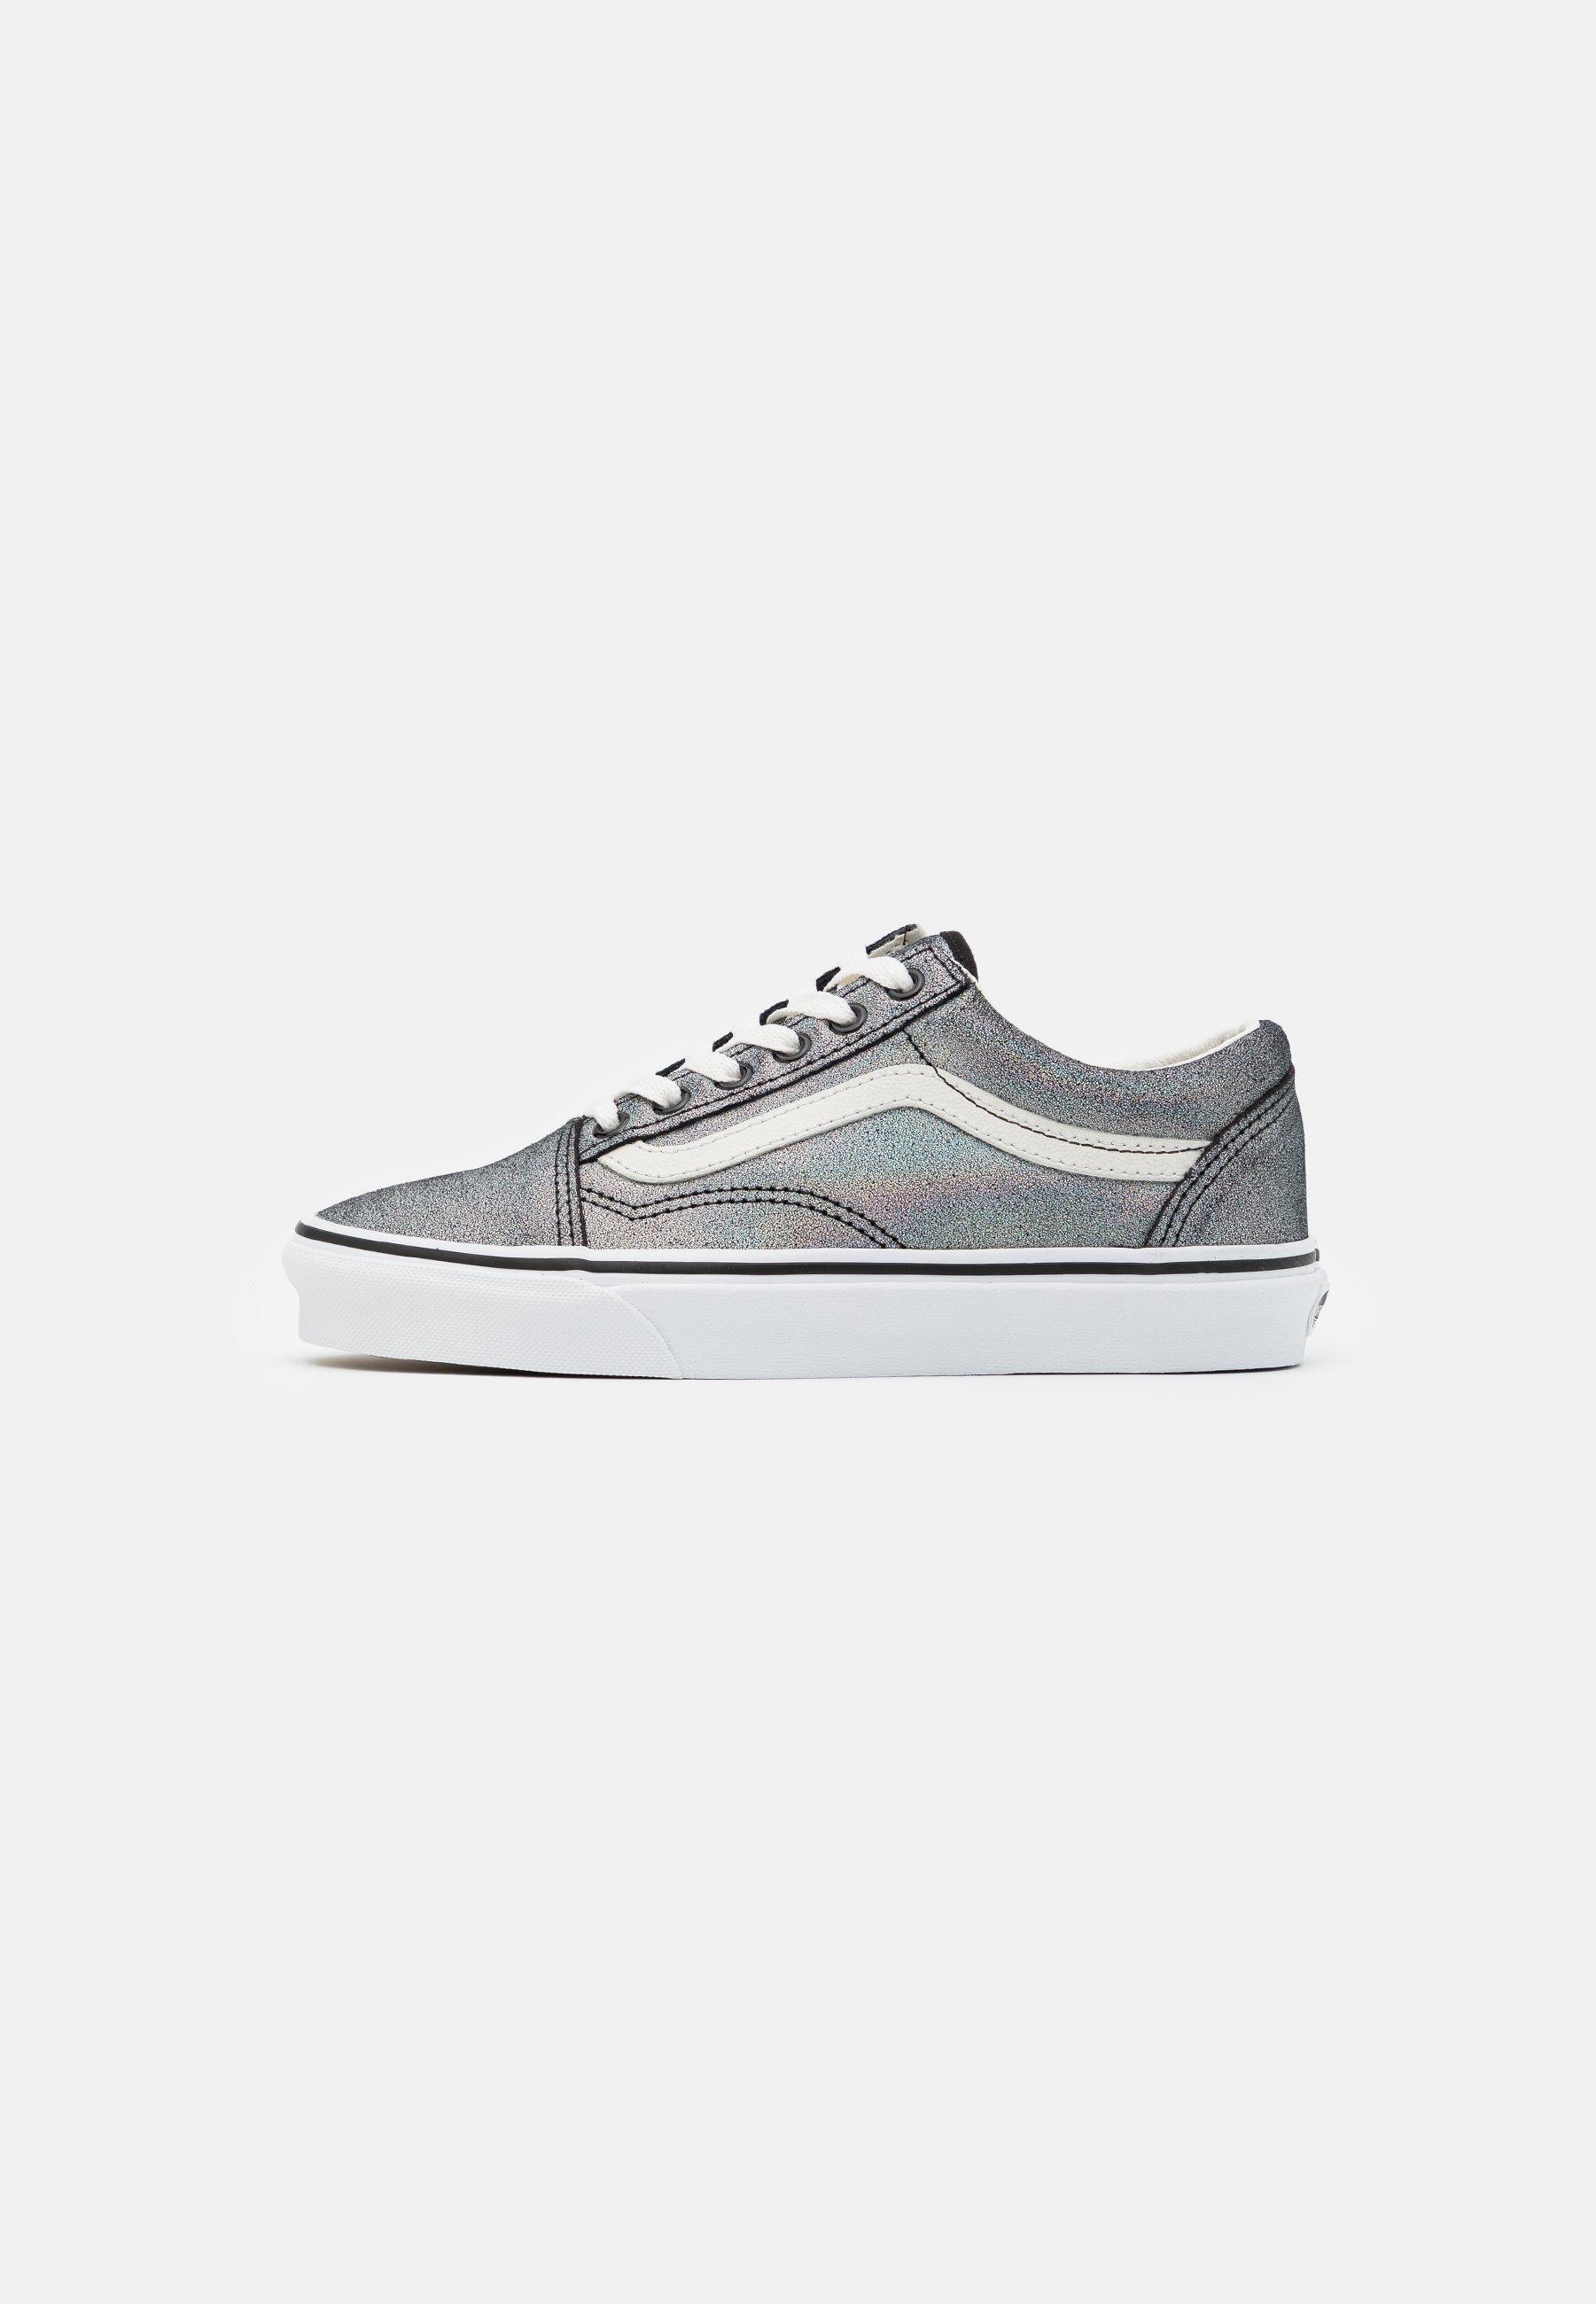 Vans OLD SKOOL - Sneakers basse - black/true white/nero - Zalando.it